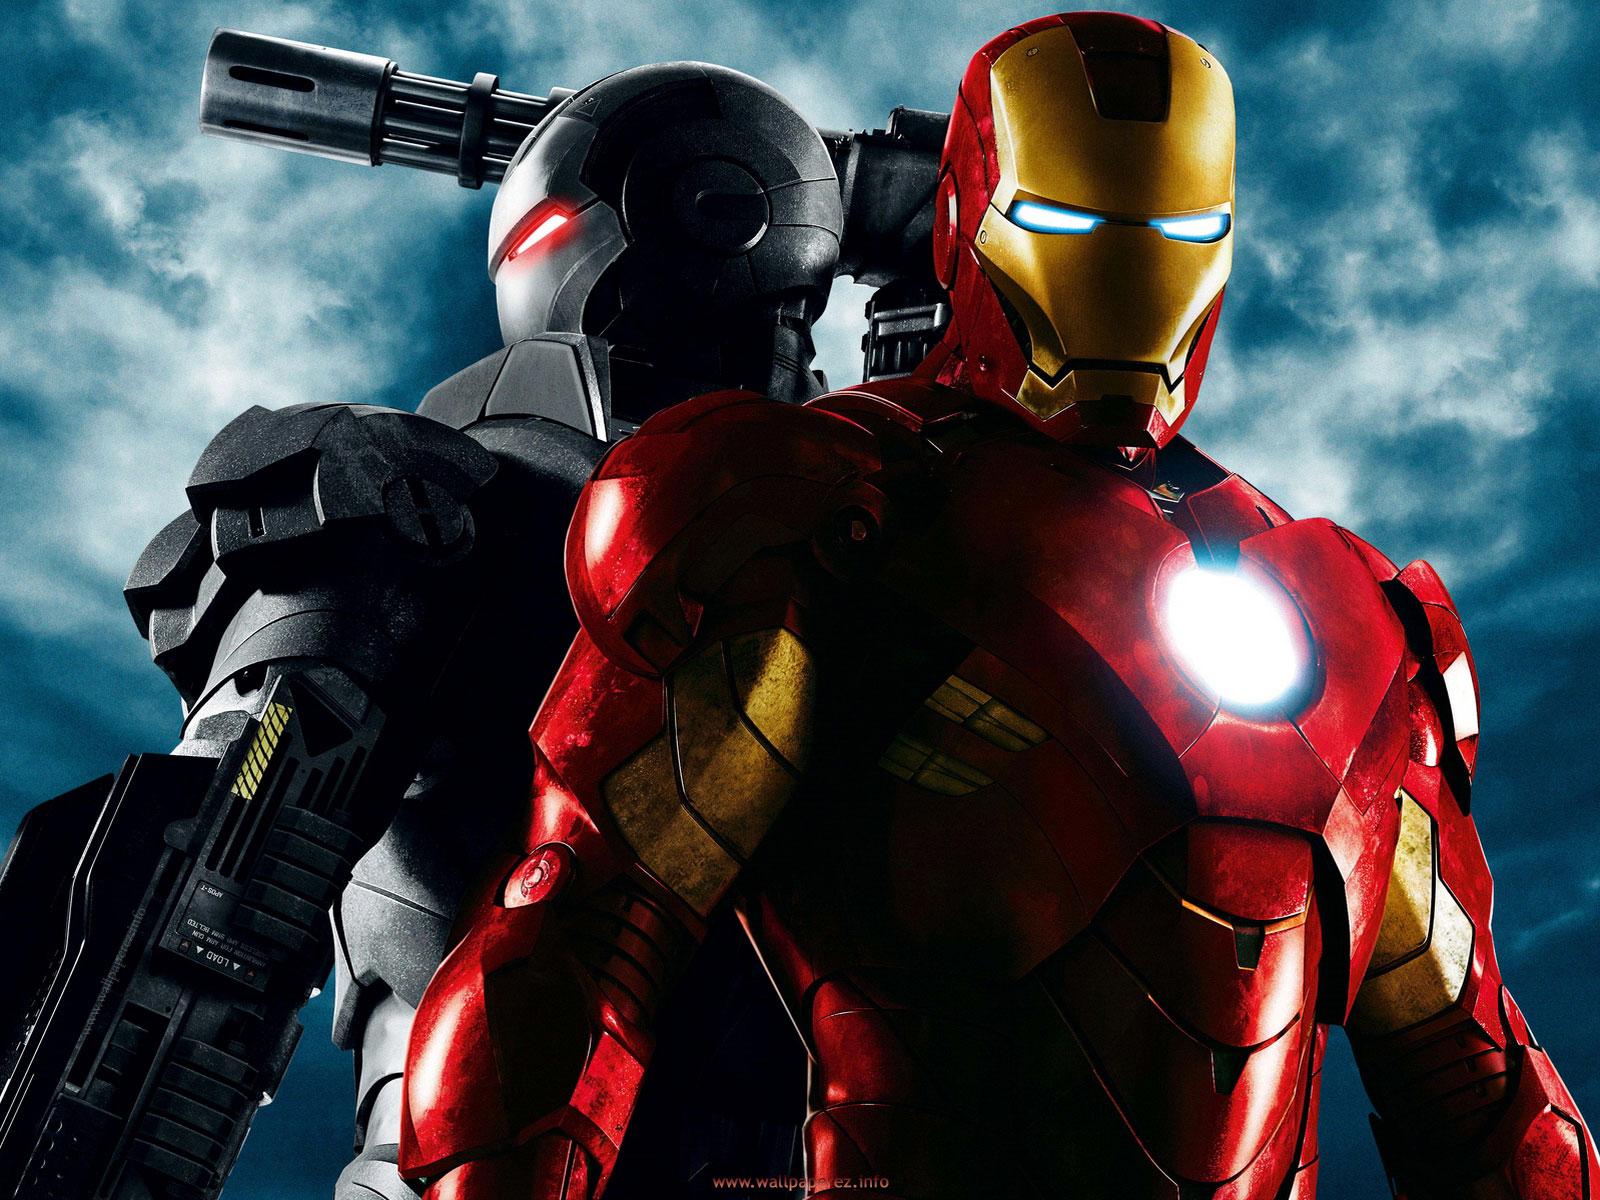 iron man wallpaper 3 iron man wallpaper 4 iron man wallpaper 5 1600x1200